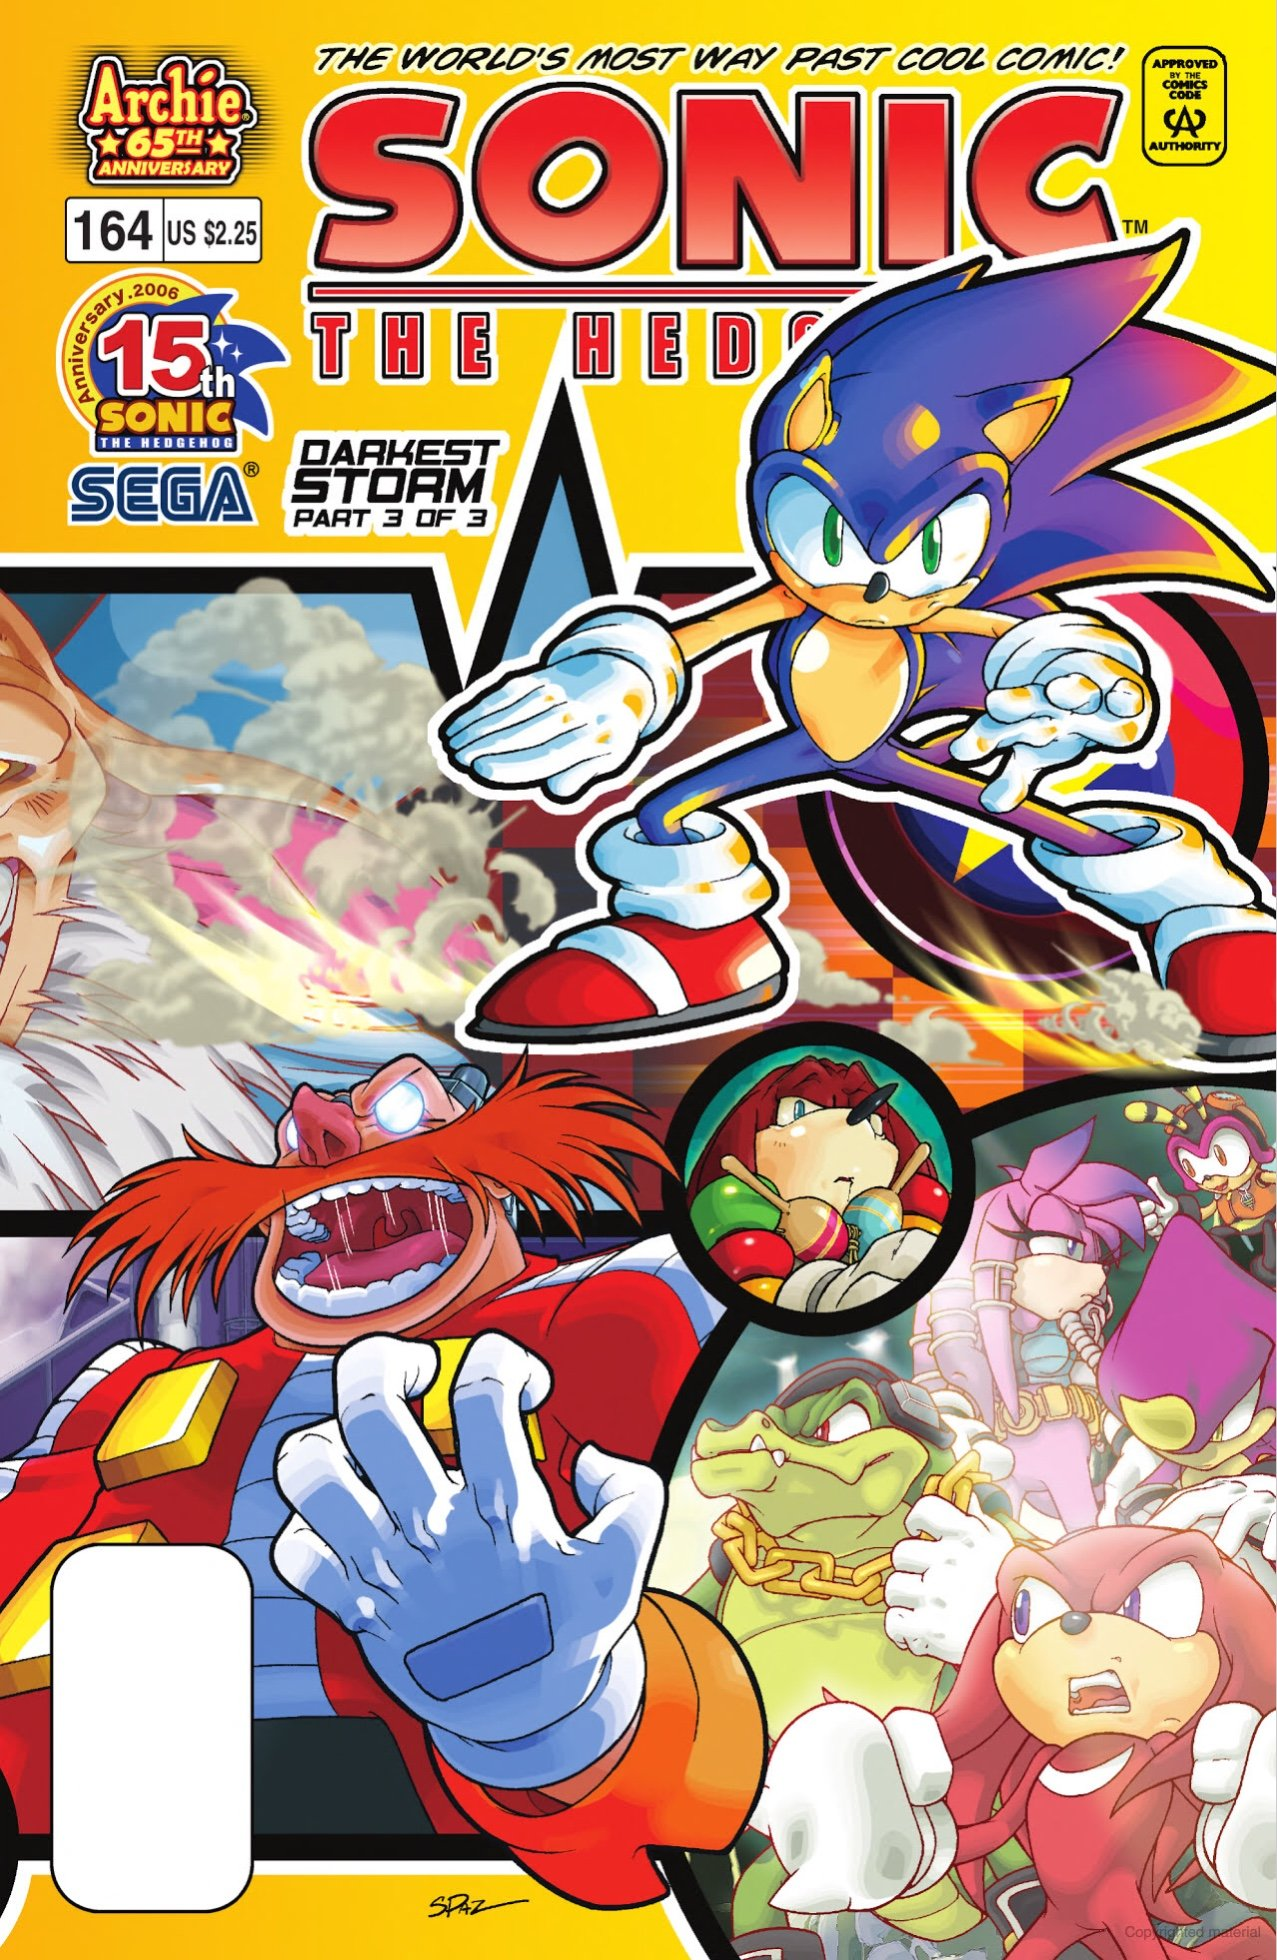 Sonic the Hedgehog 164 (September 2006)